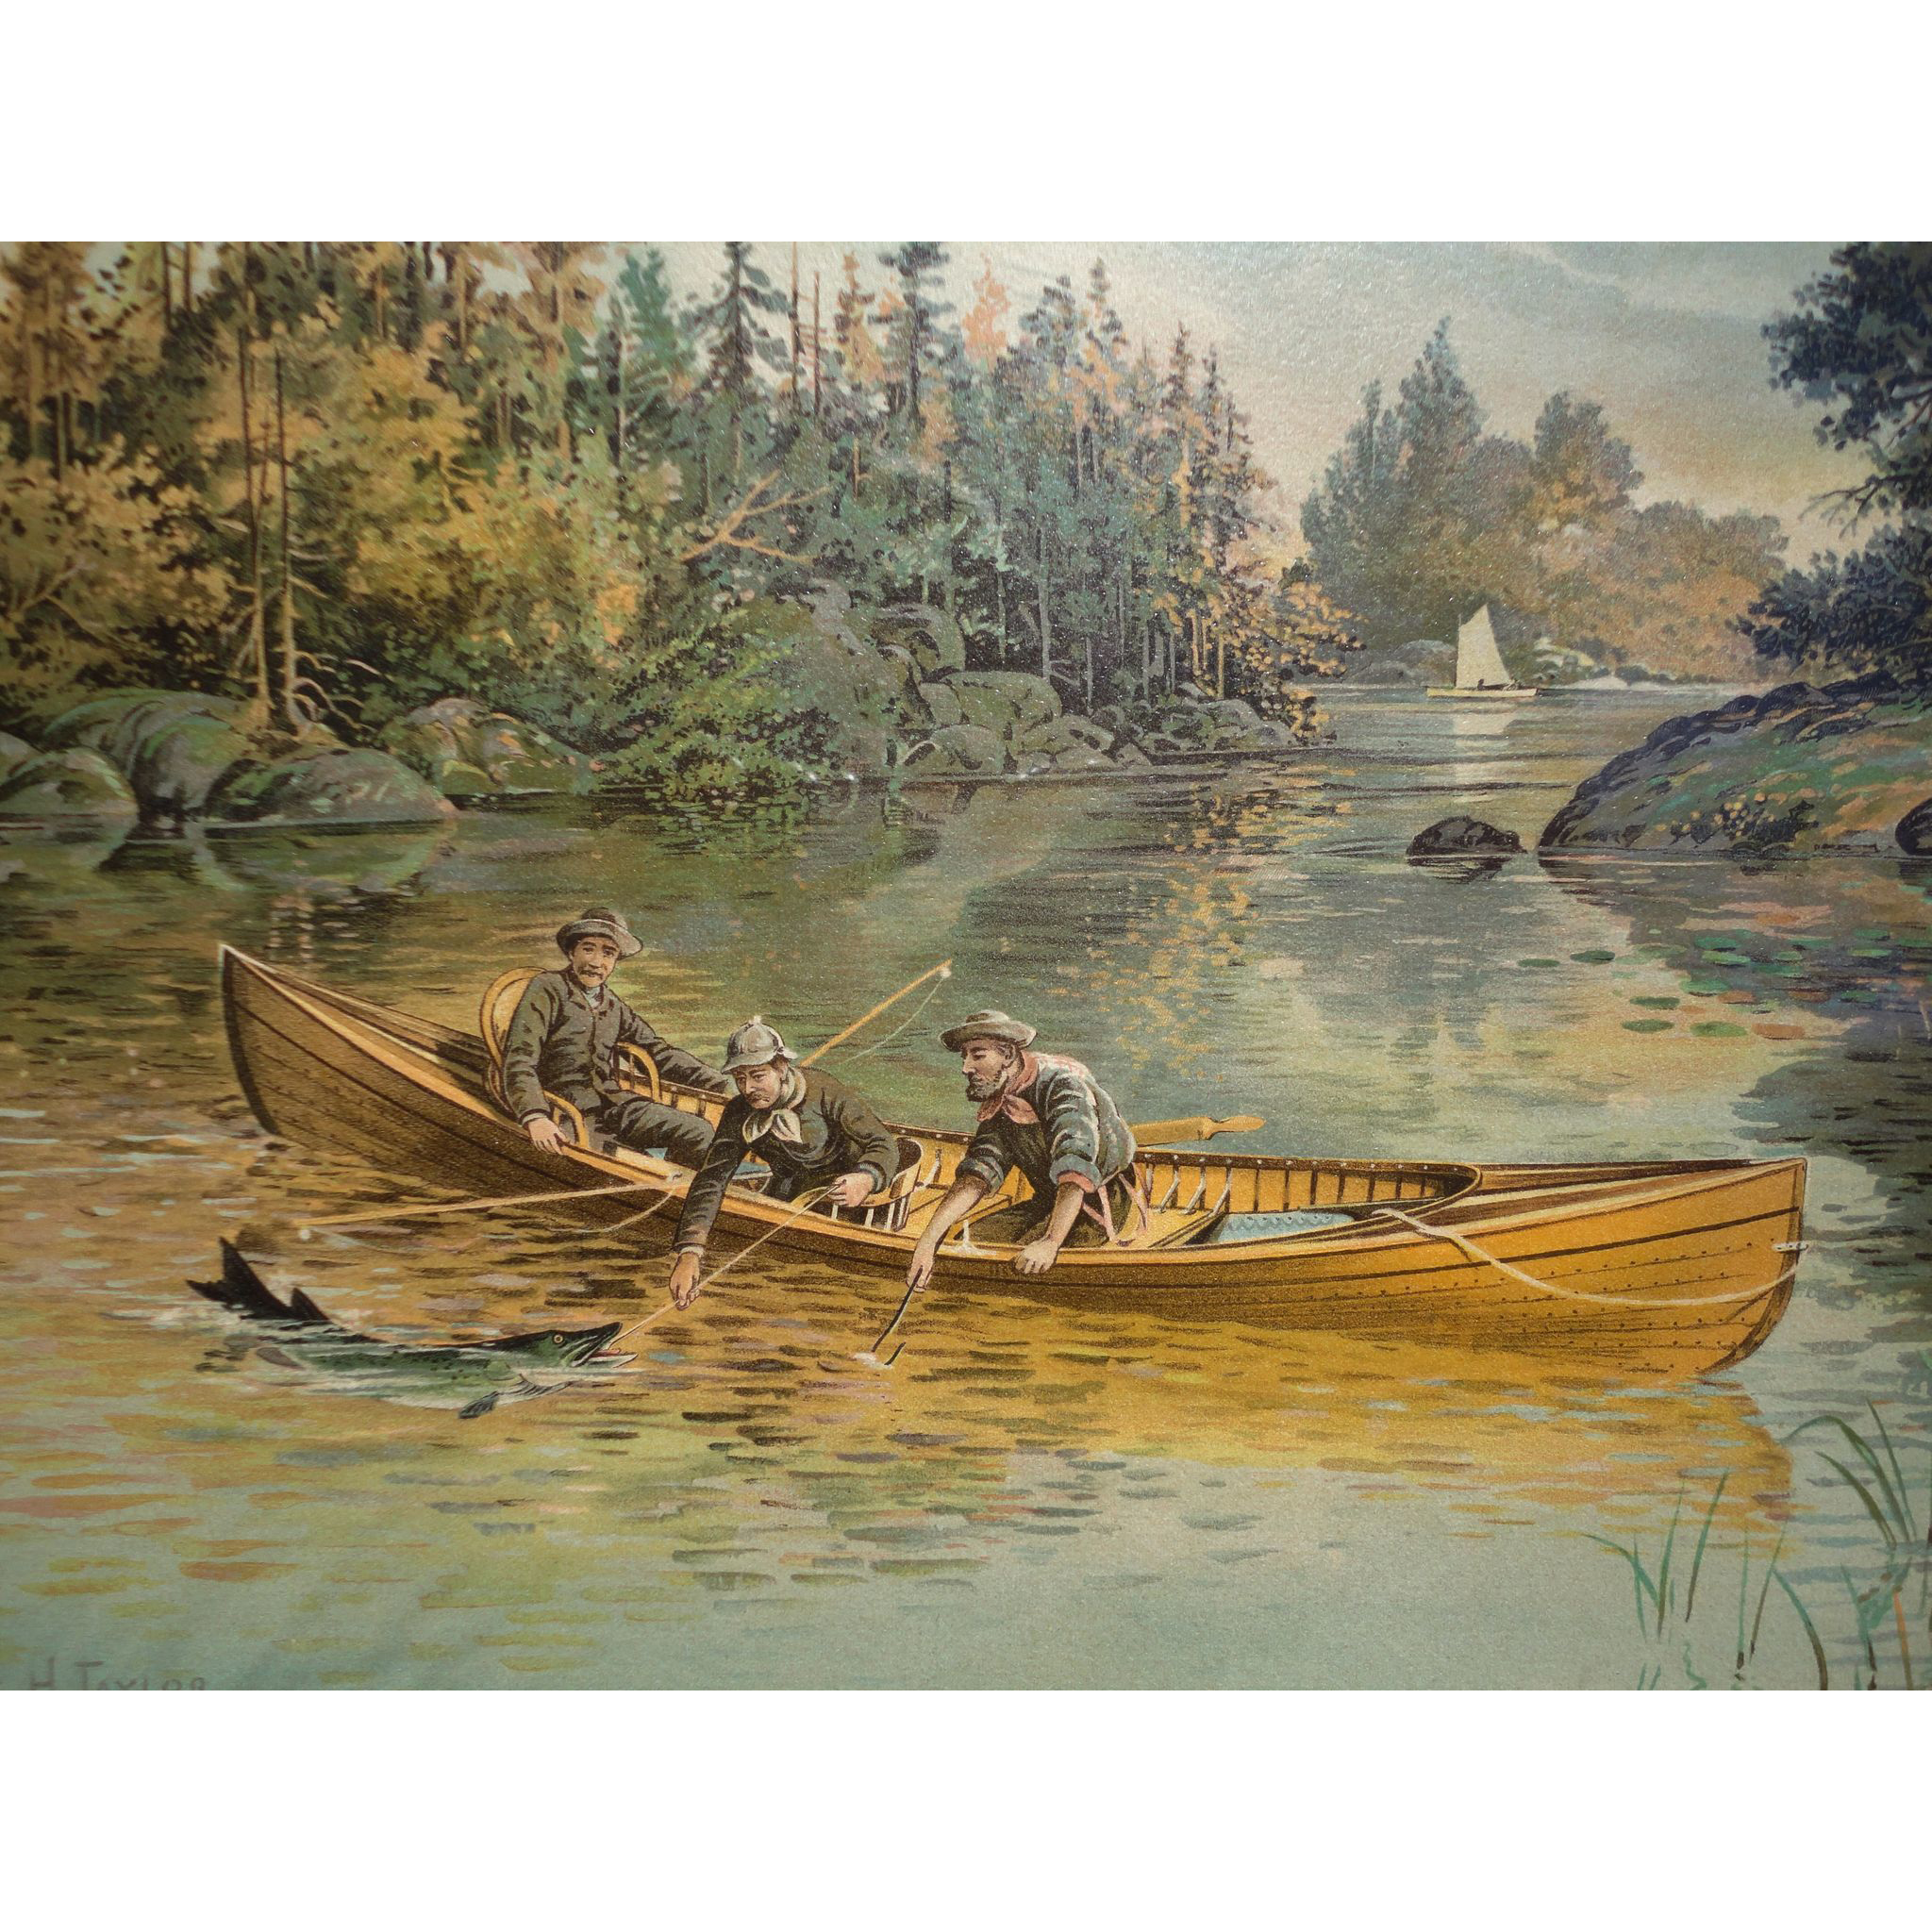 Gone Fishing - Frank H. Taylor (1846-1926) Vintage Print Salmon Fishing